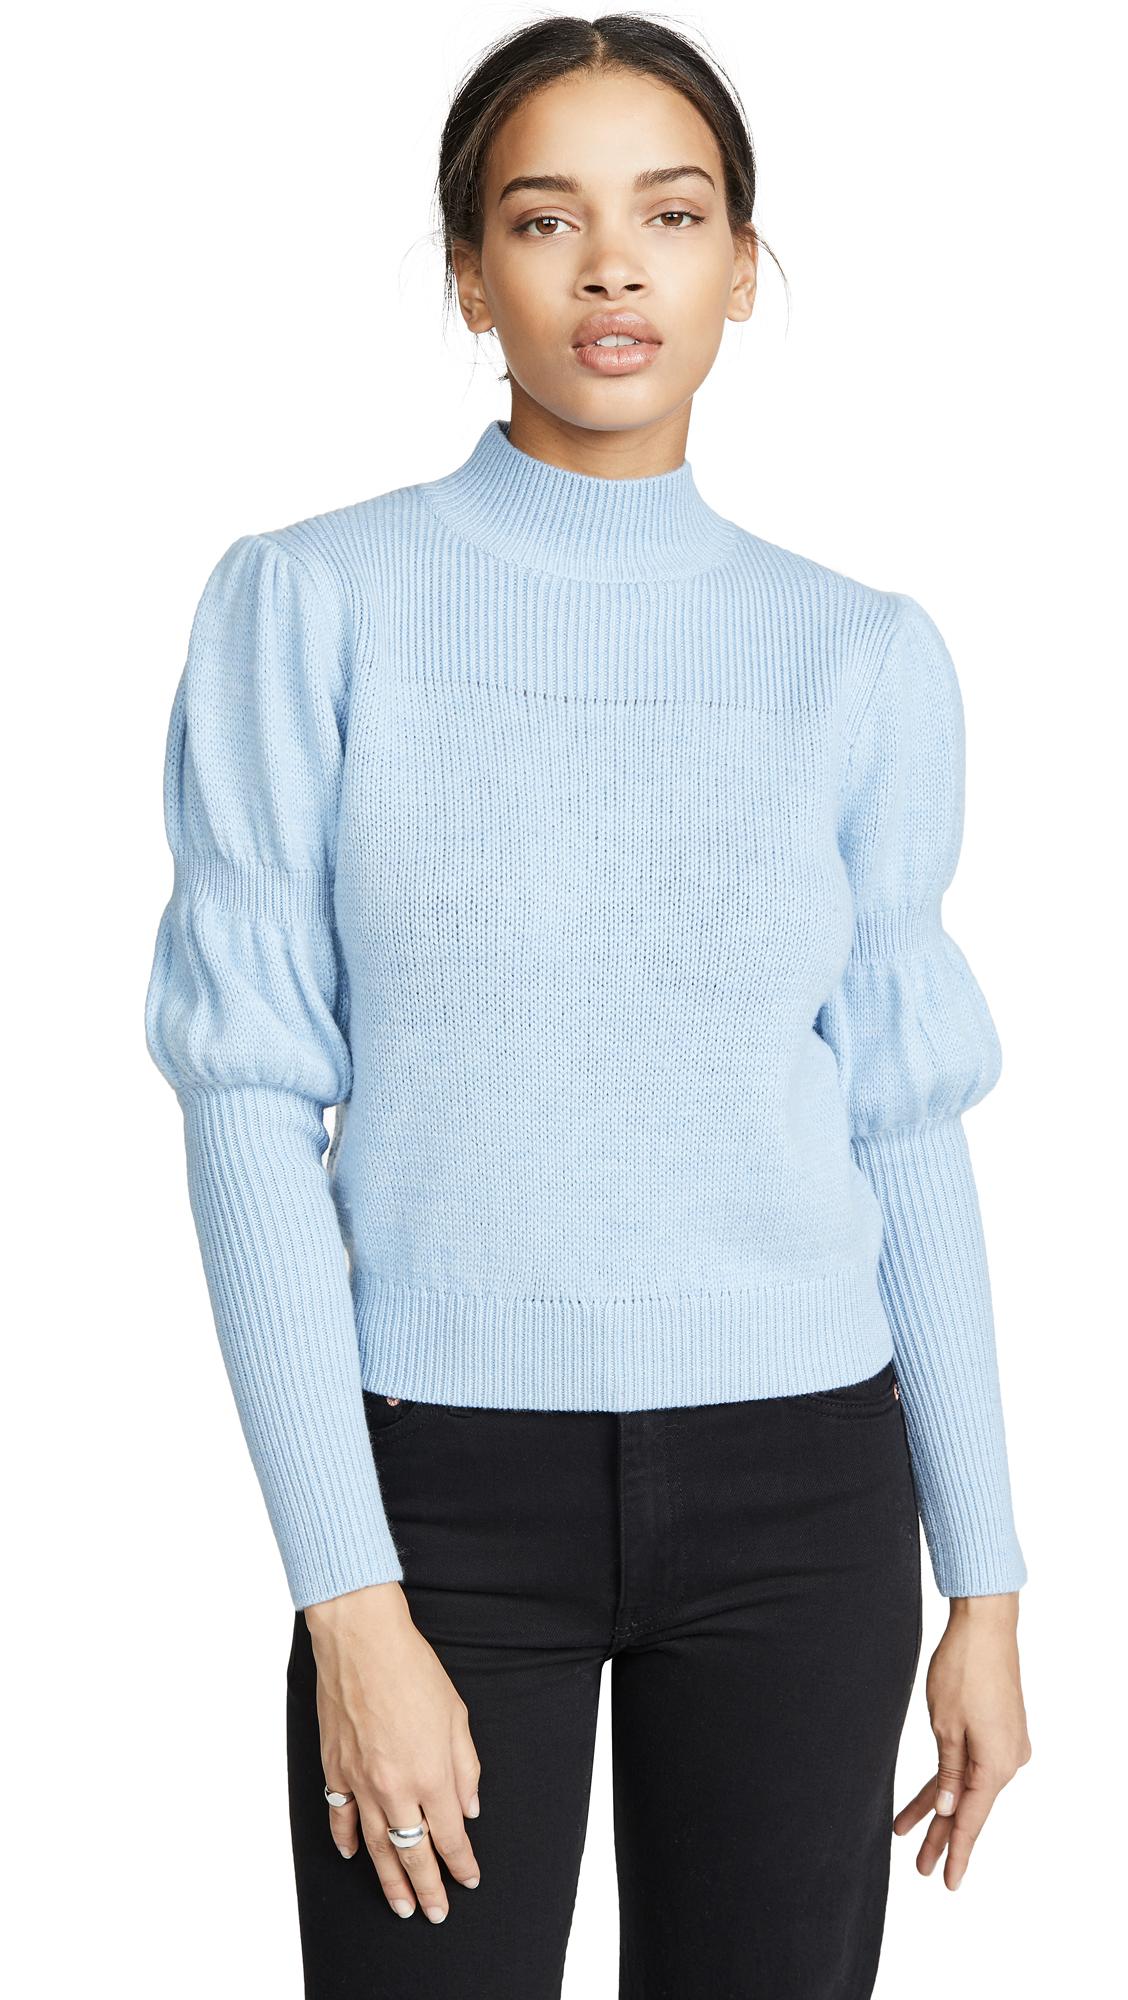 Derek Lam 10 Crosby Puff Sleeve Sweater - Blue